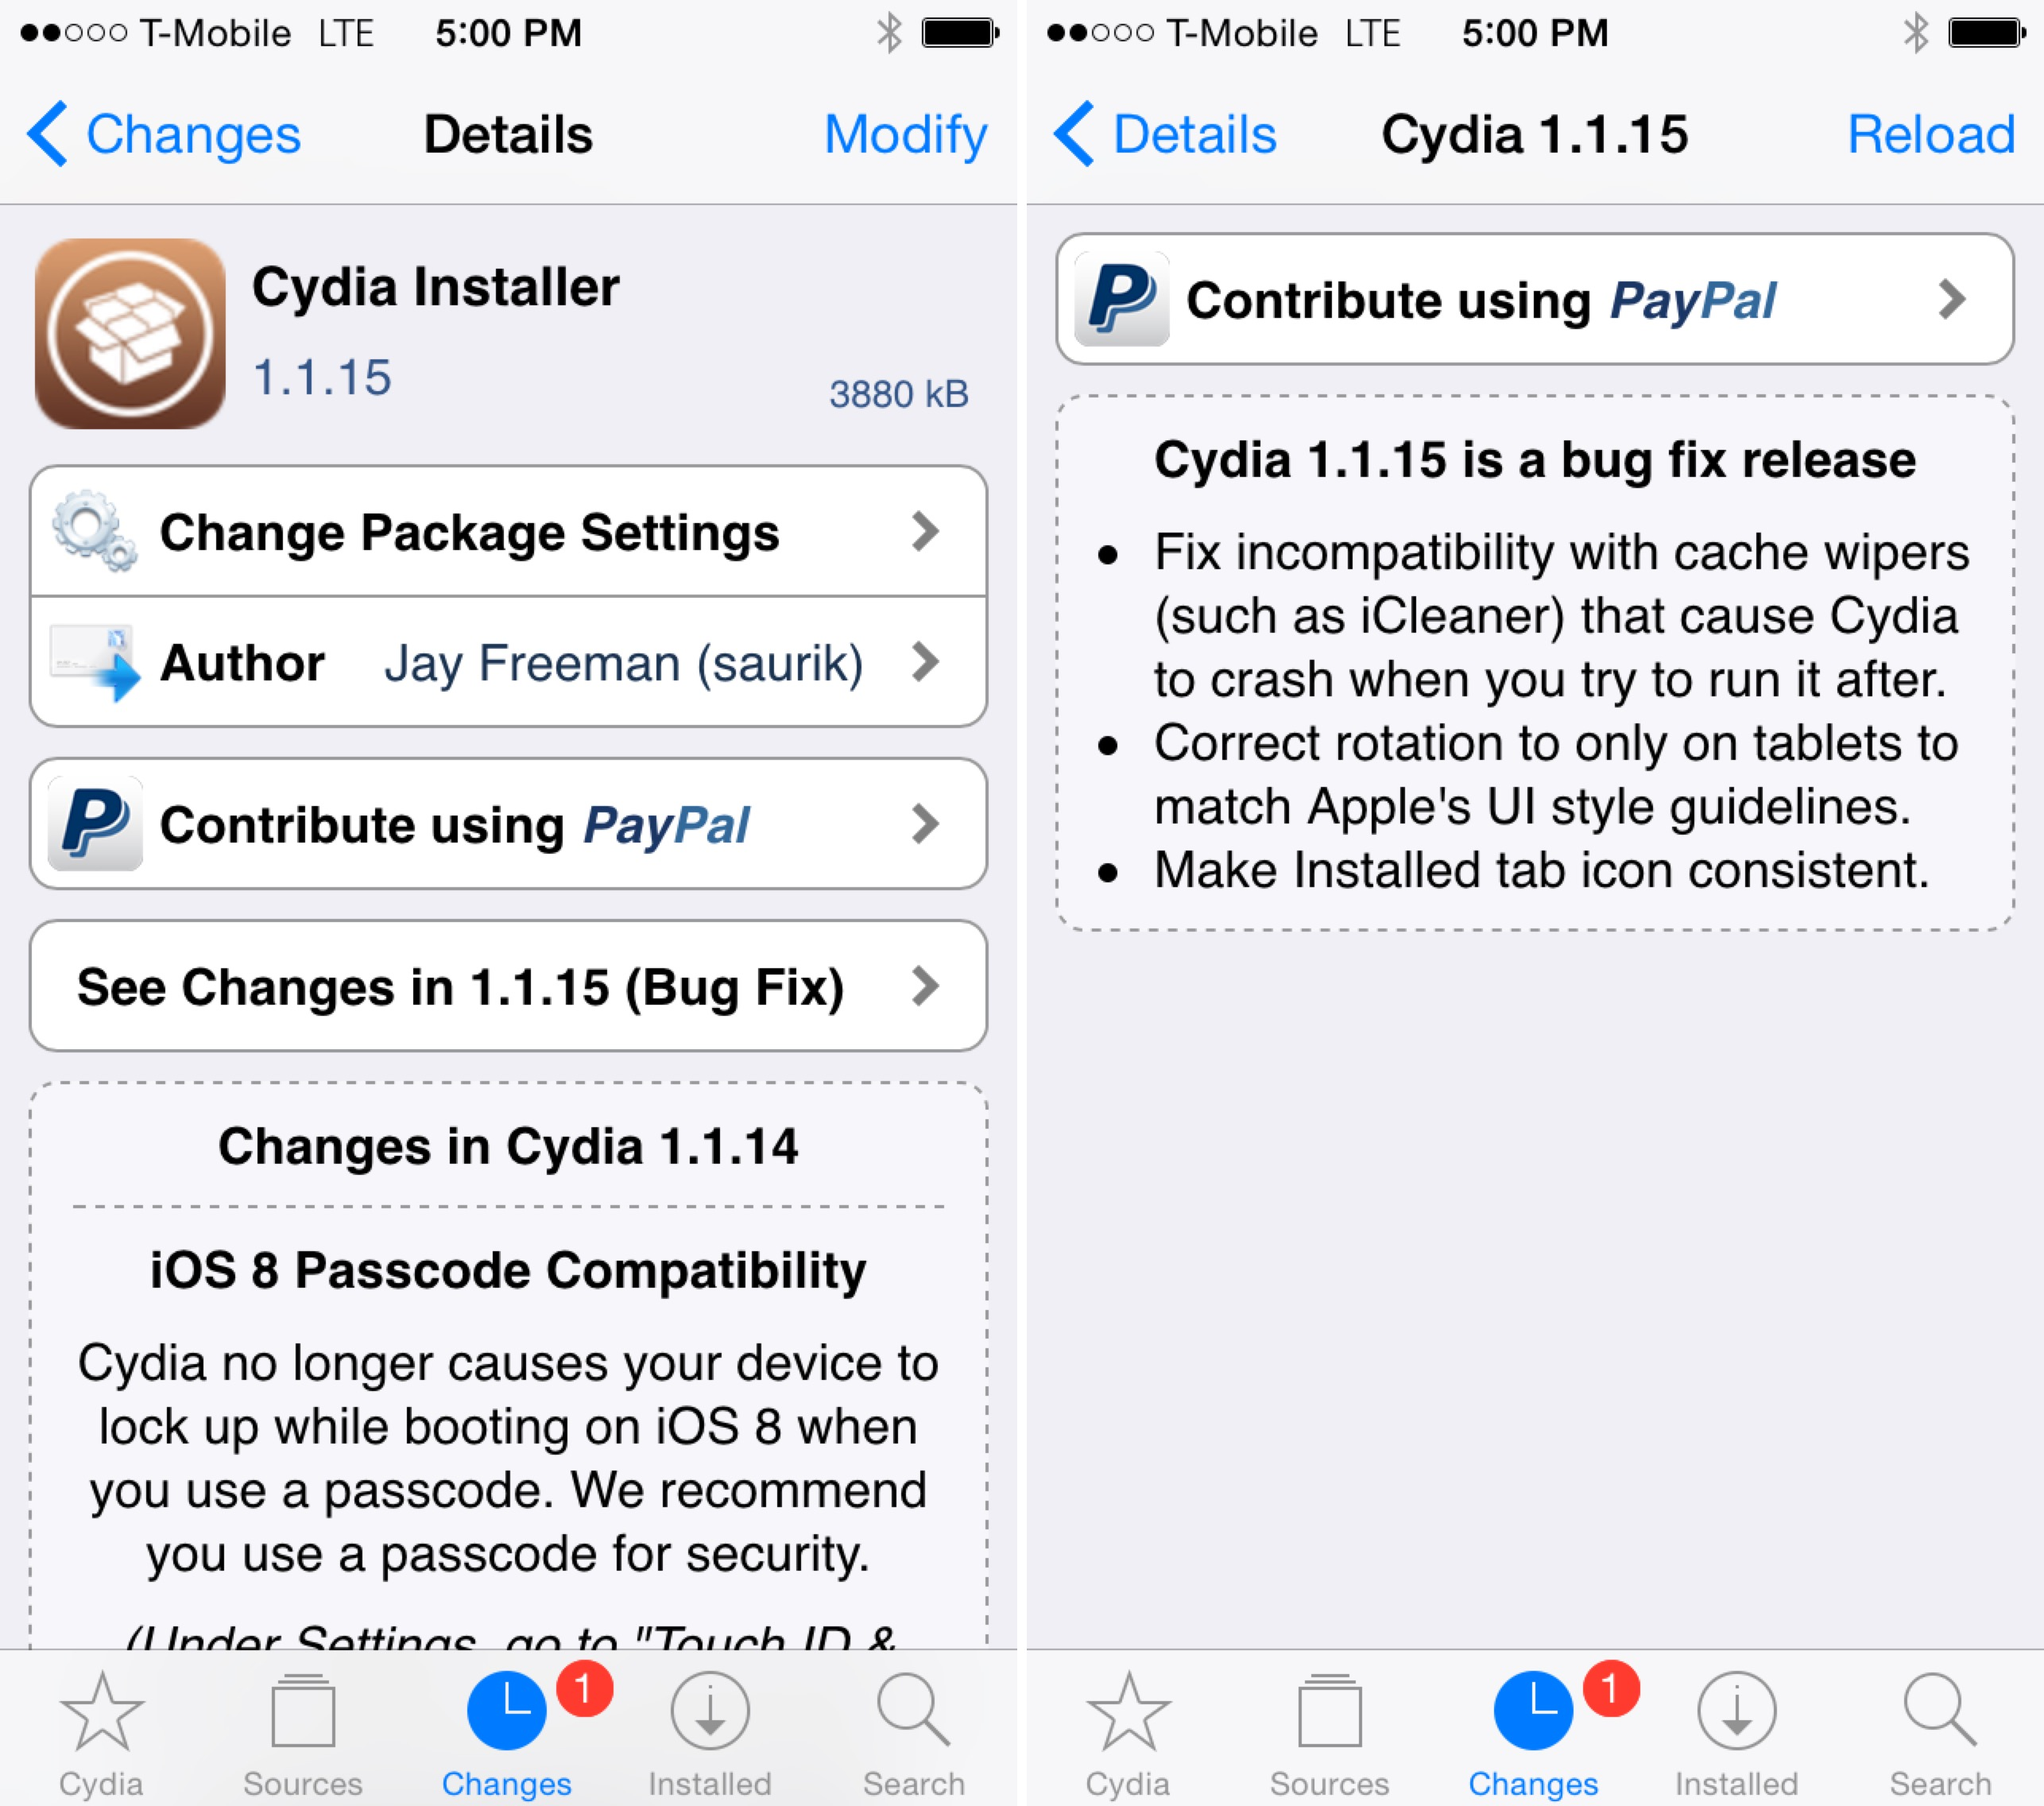 Cydia 1.1.15 bug fixes